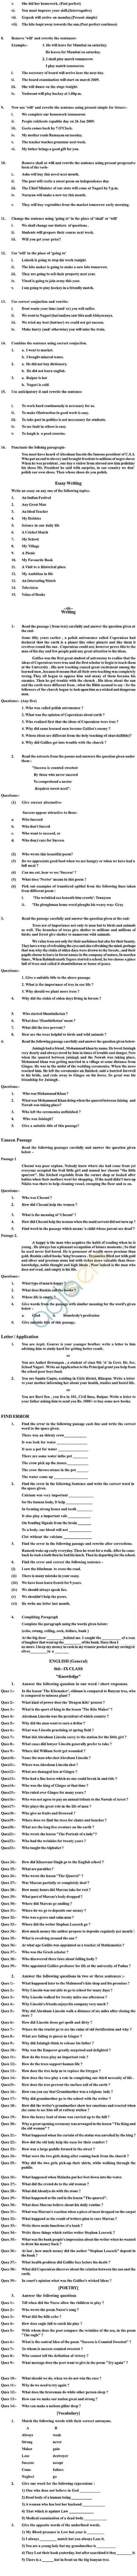 Chhattisgarh Board Class 09 Question Bank -General English